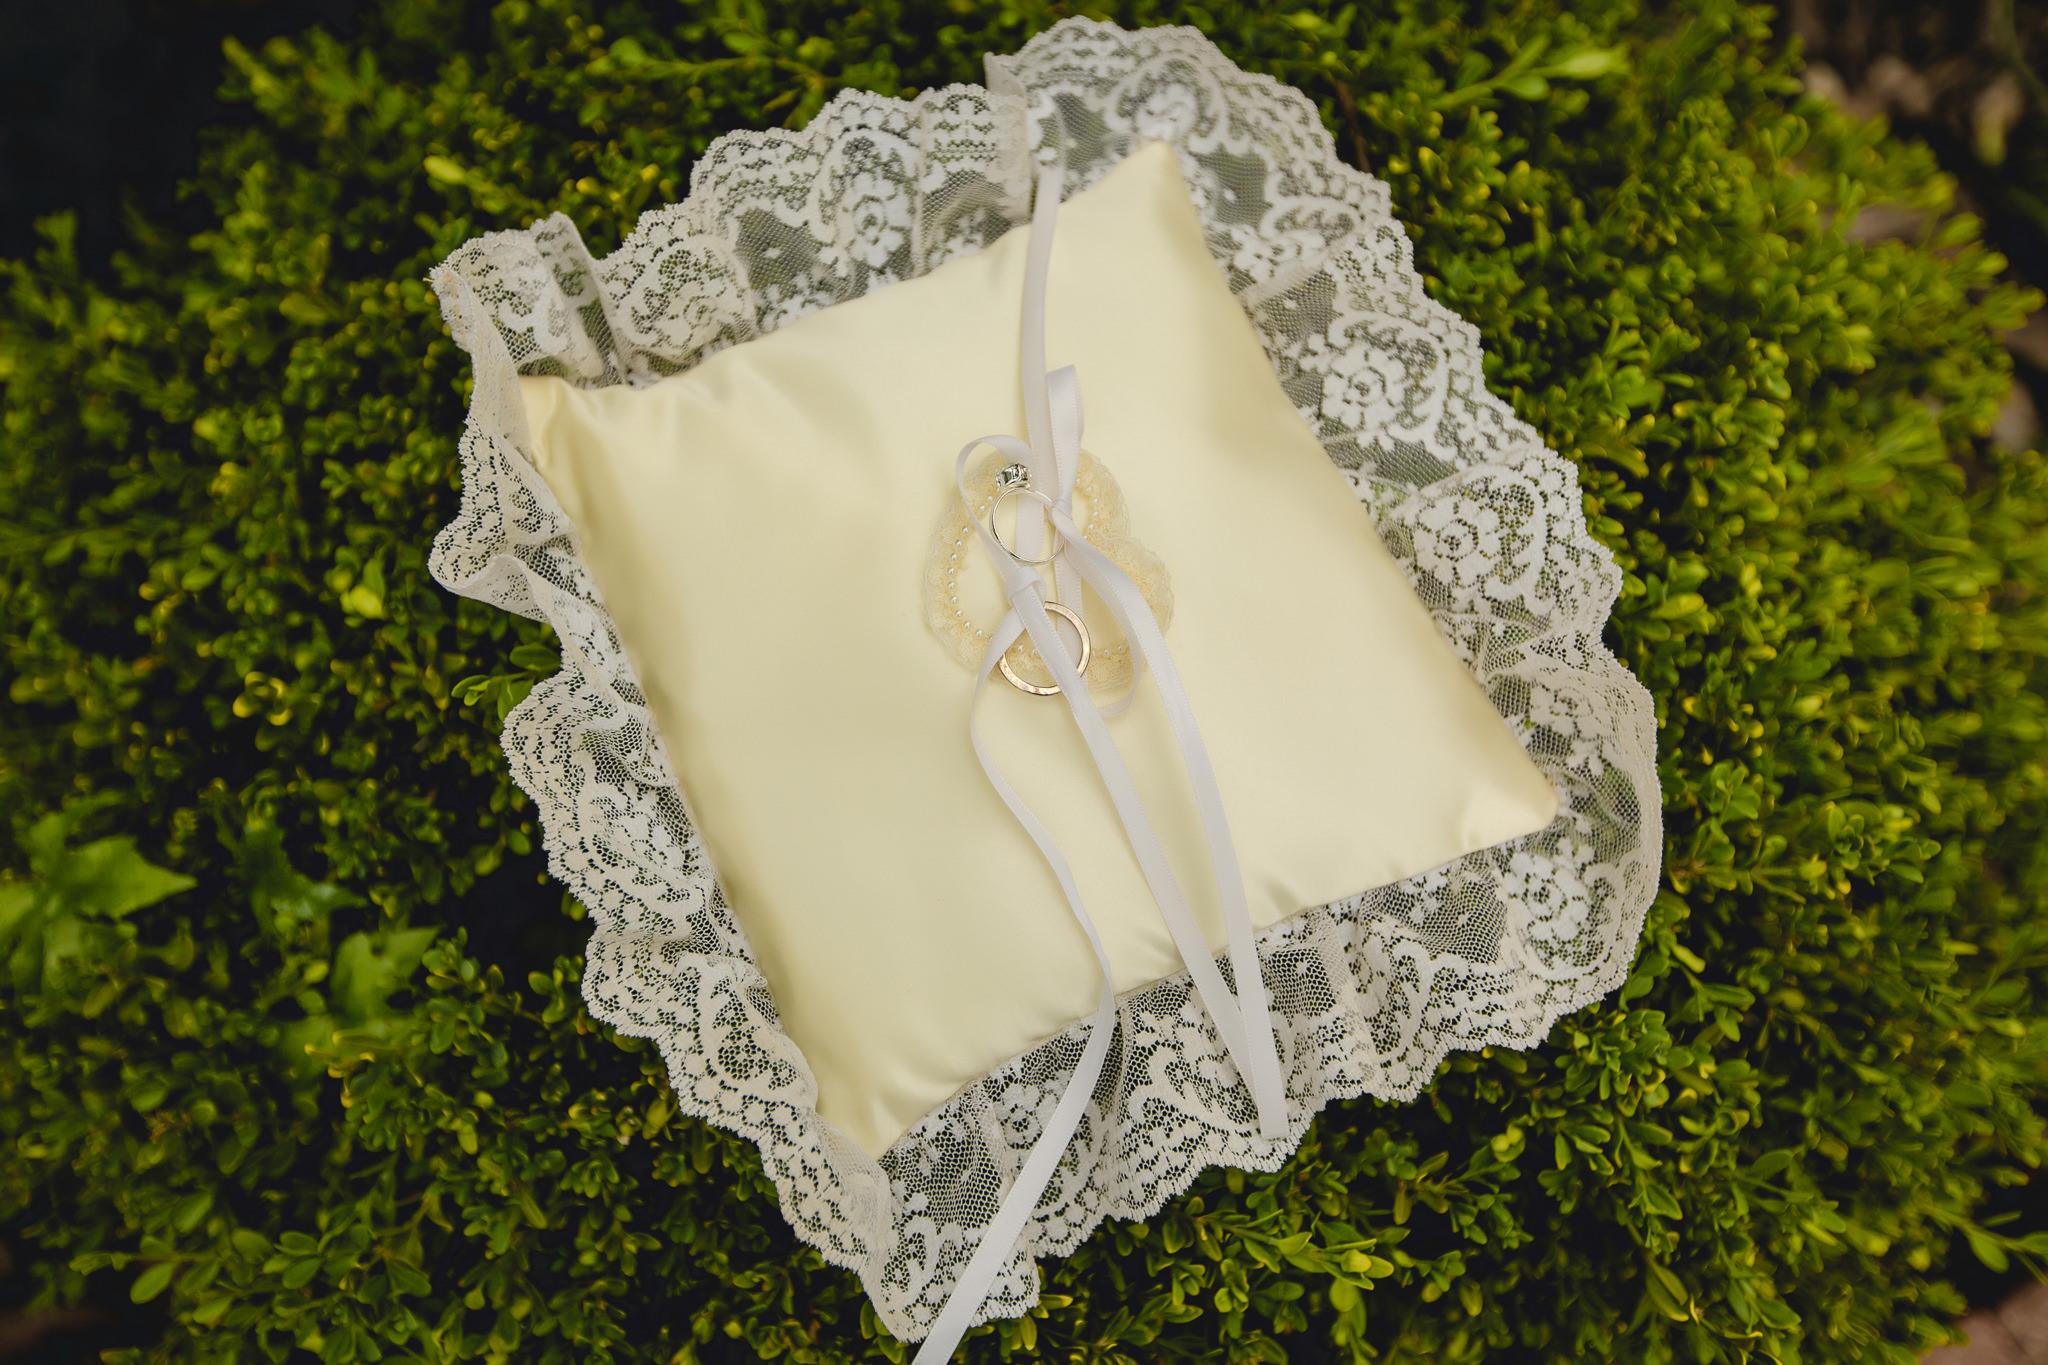 Ring bearer's pillow at St. John Neumann Church wedding ceremony